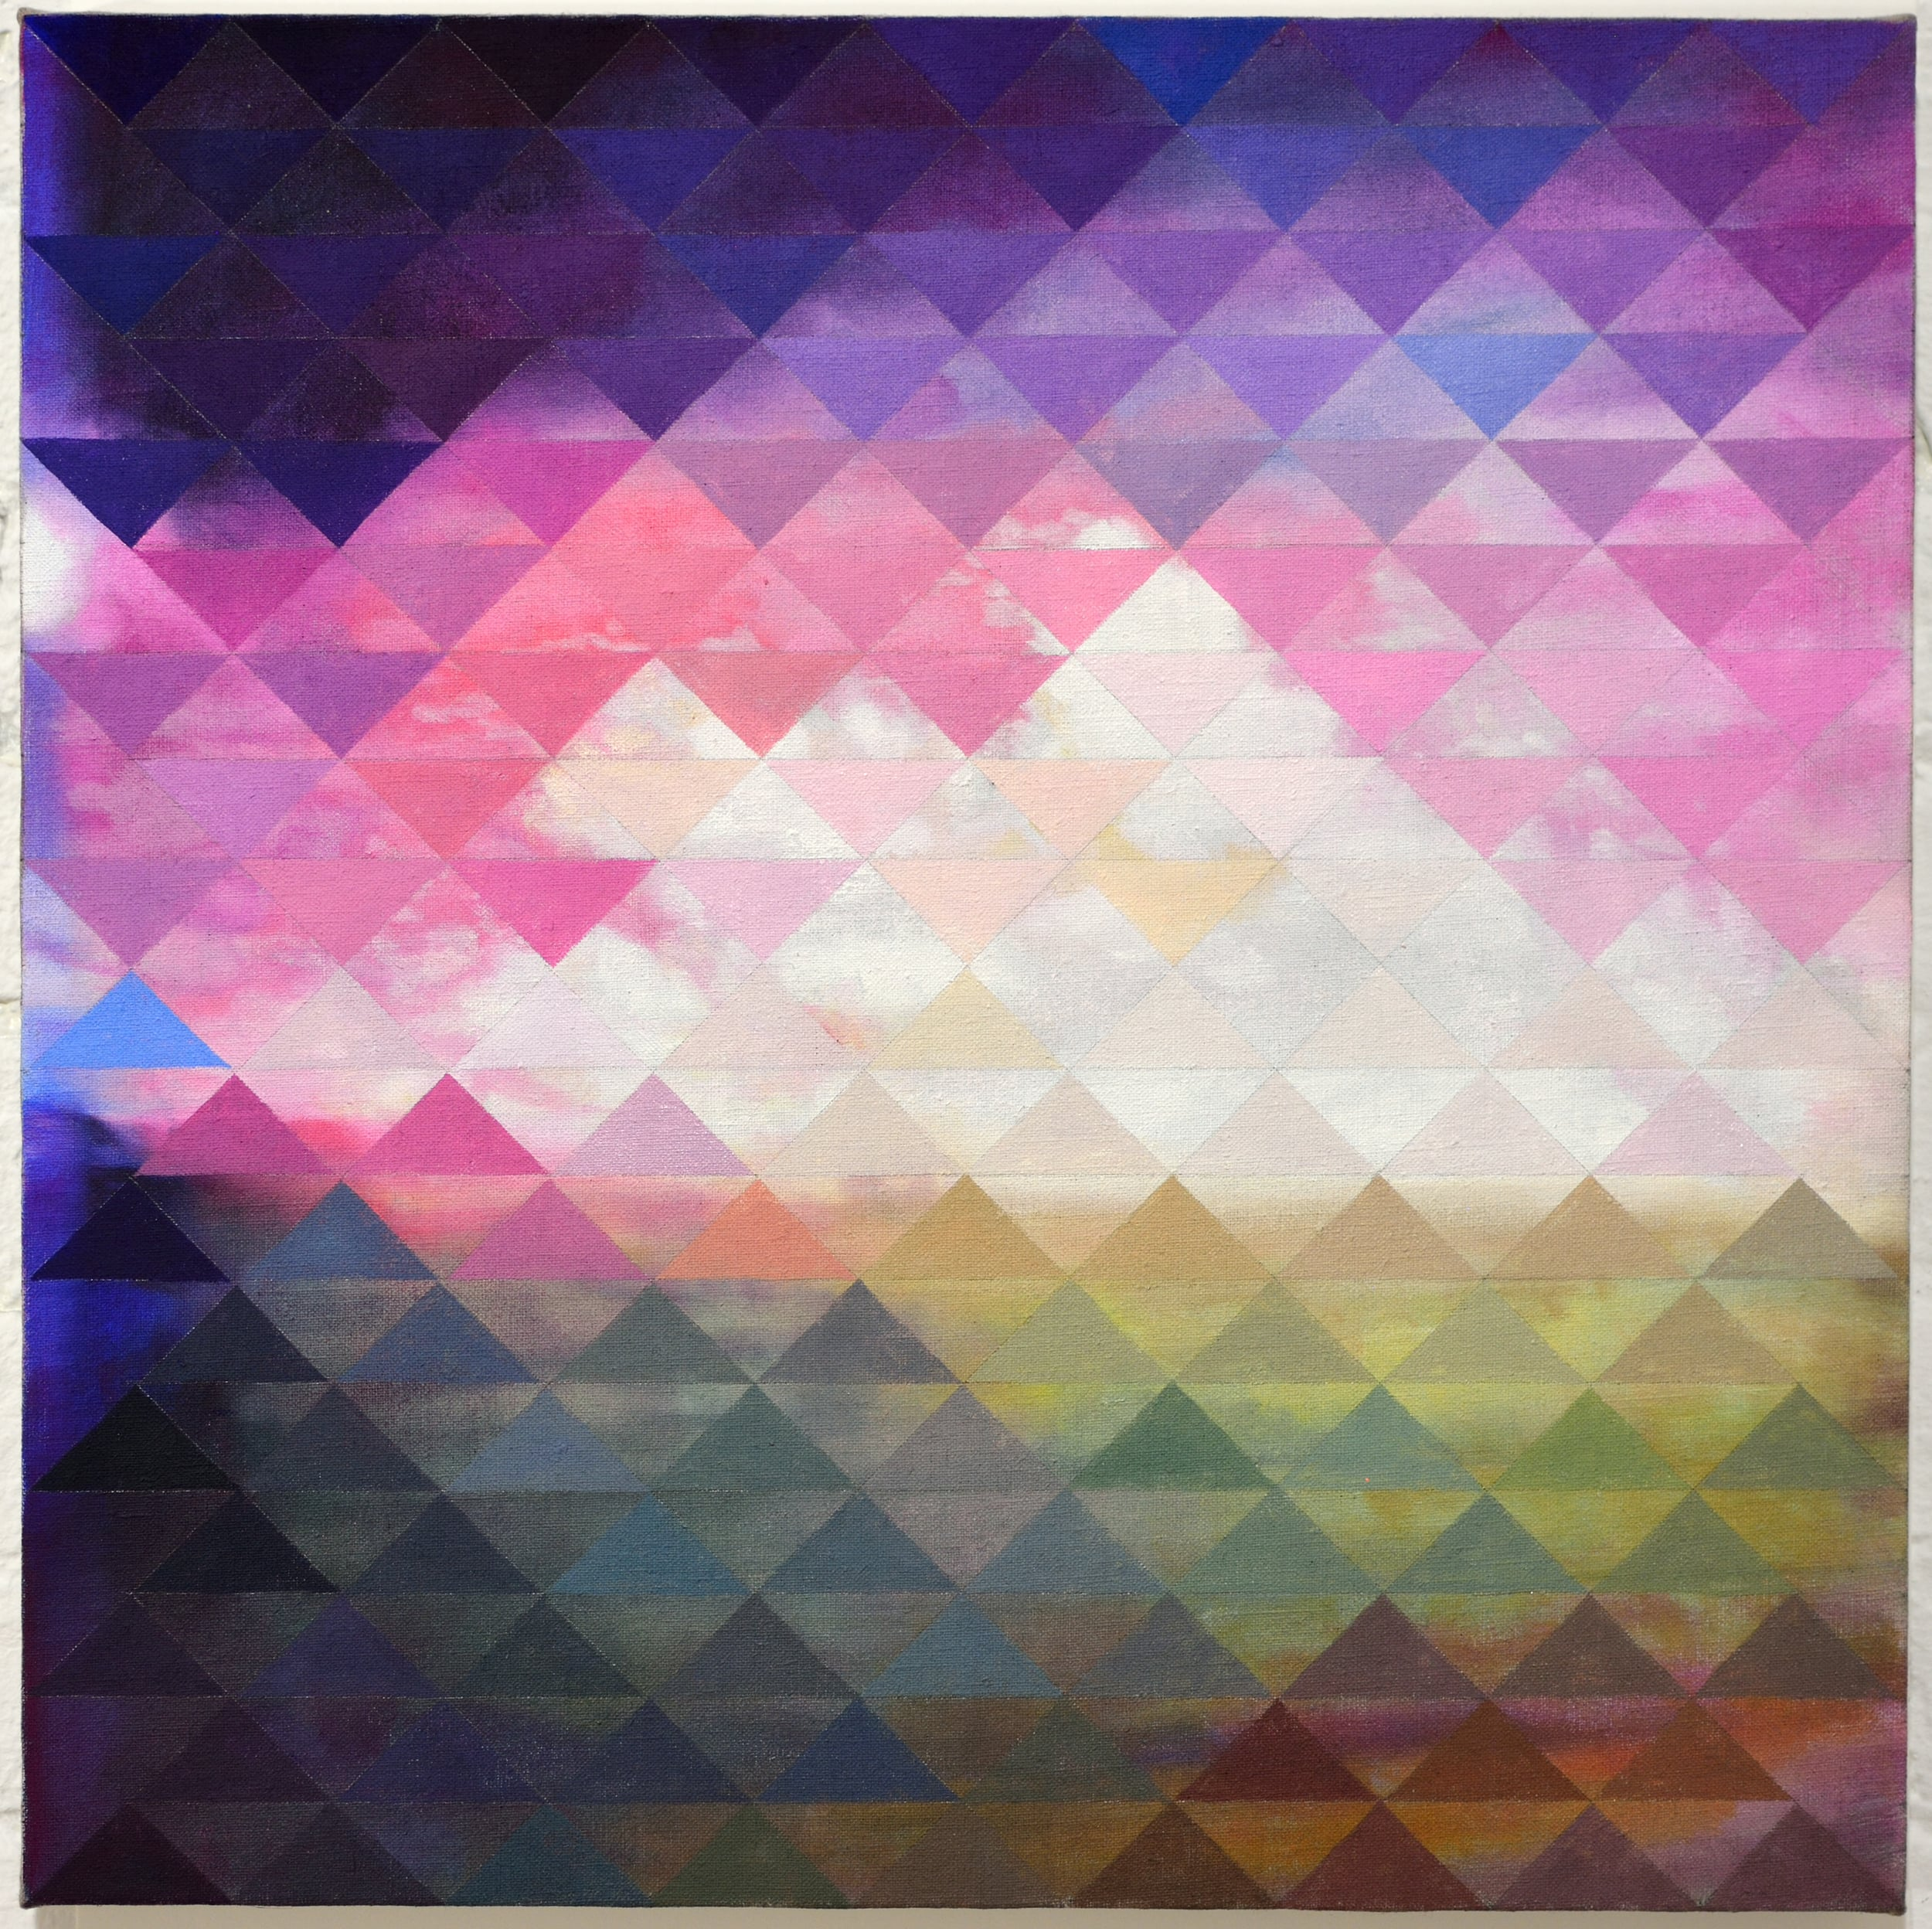 "Untitled (Veil II) 2016 oil paint on linen 18 x 18"""